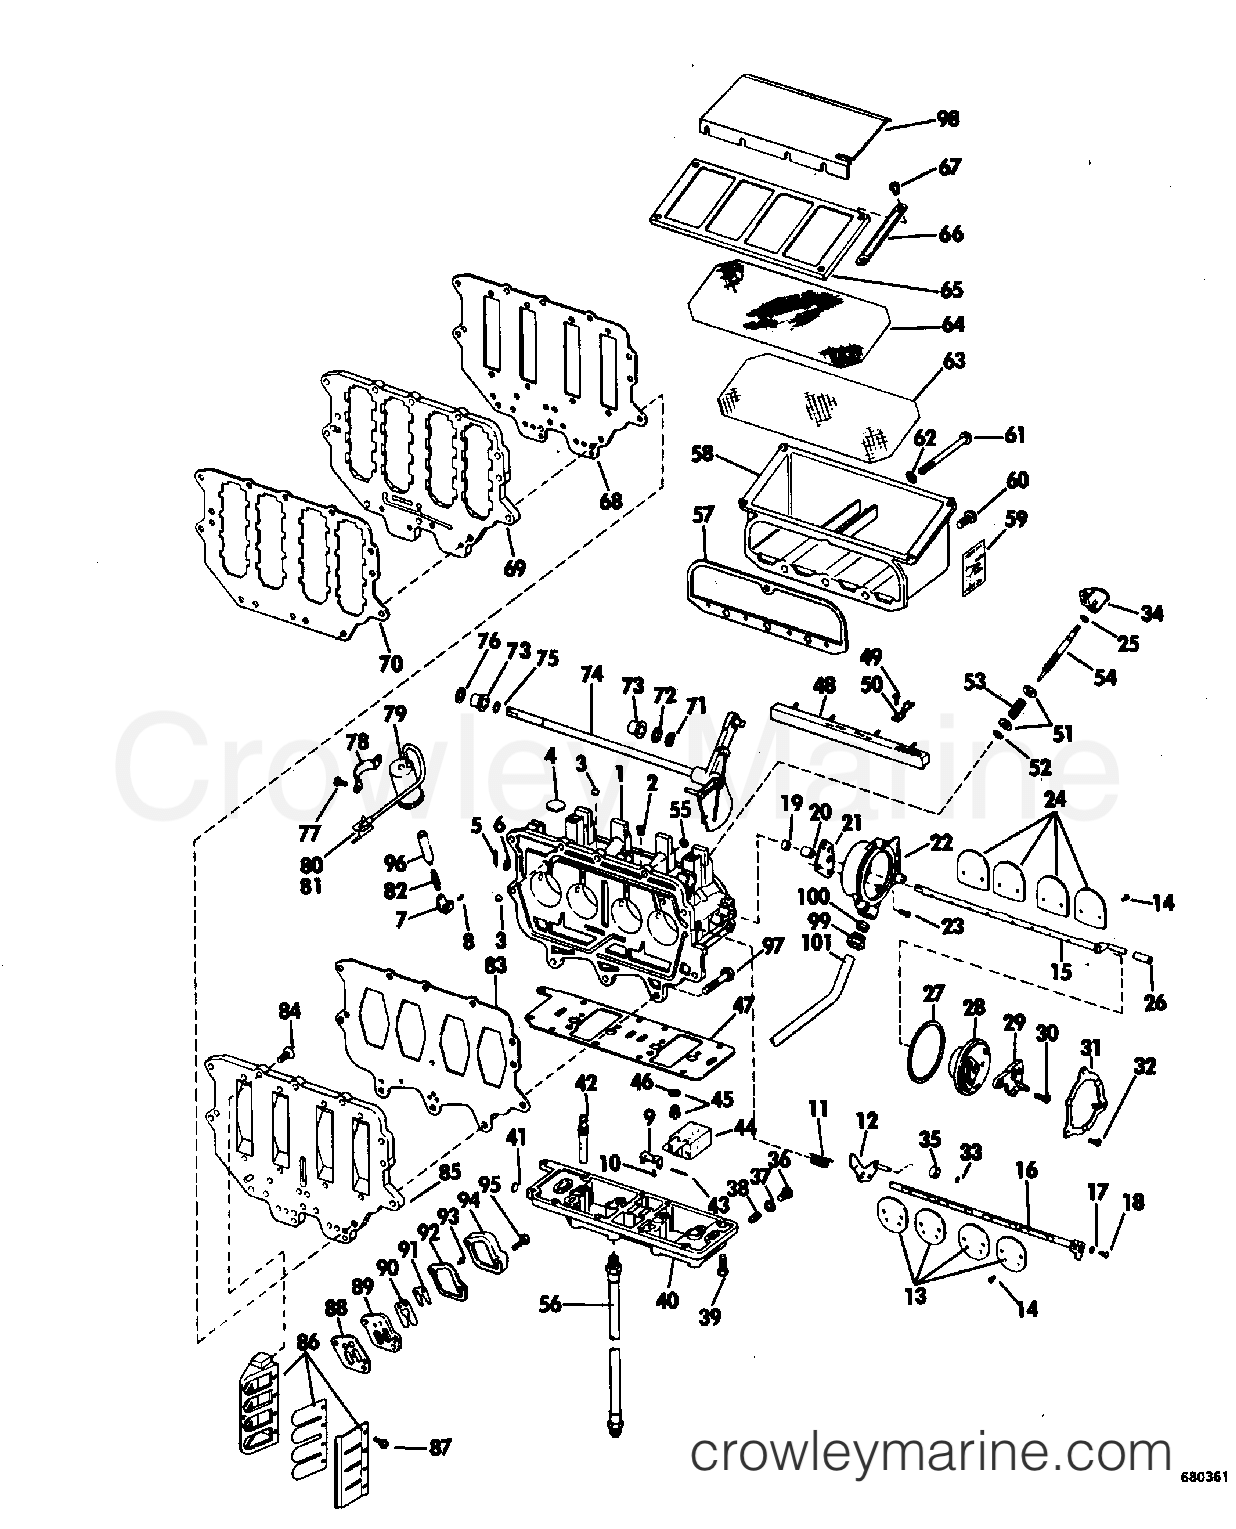 1968 OMC Stern Drive 90 - DU-15S CARBURETOR GROUP section